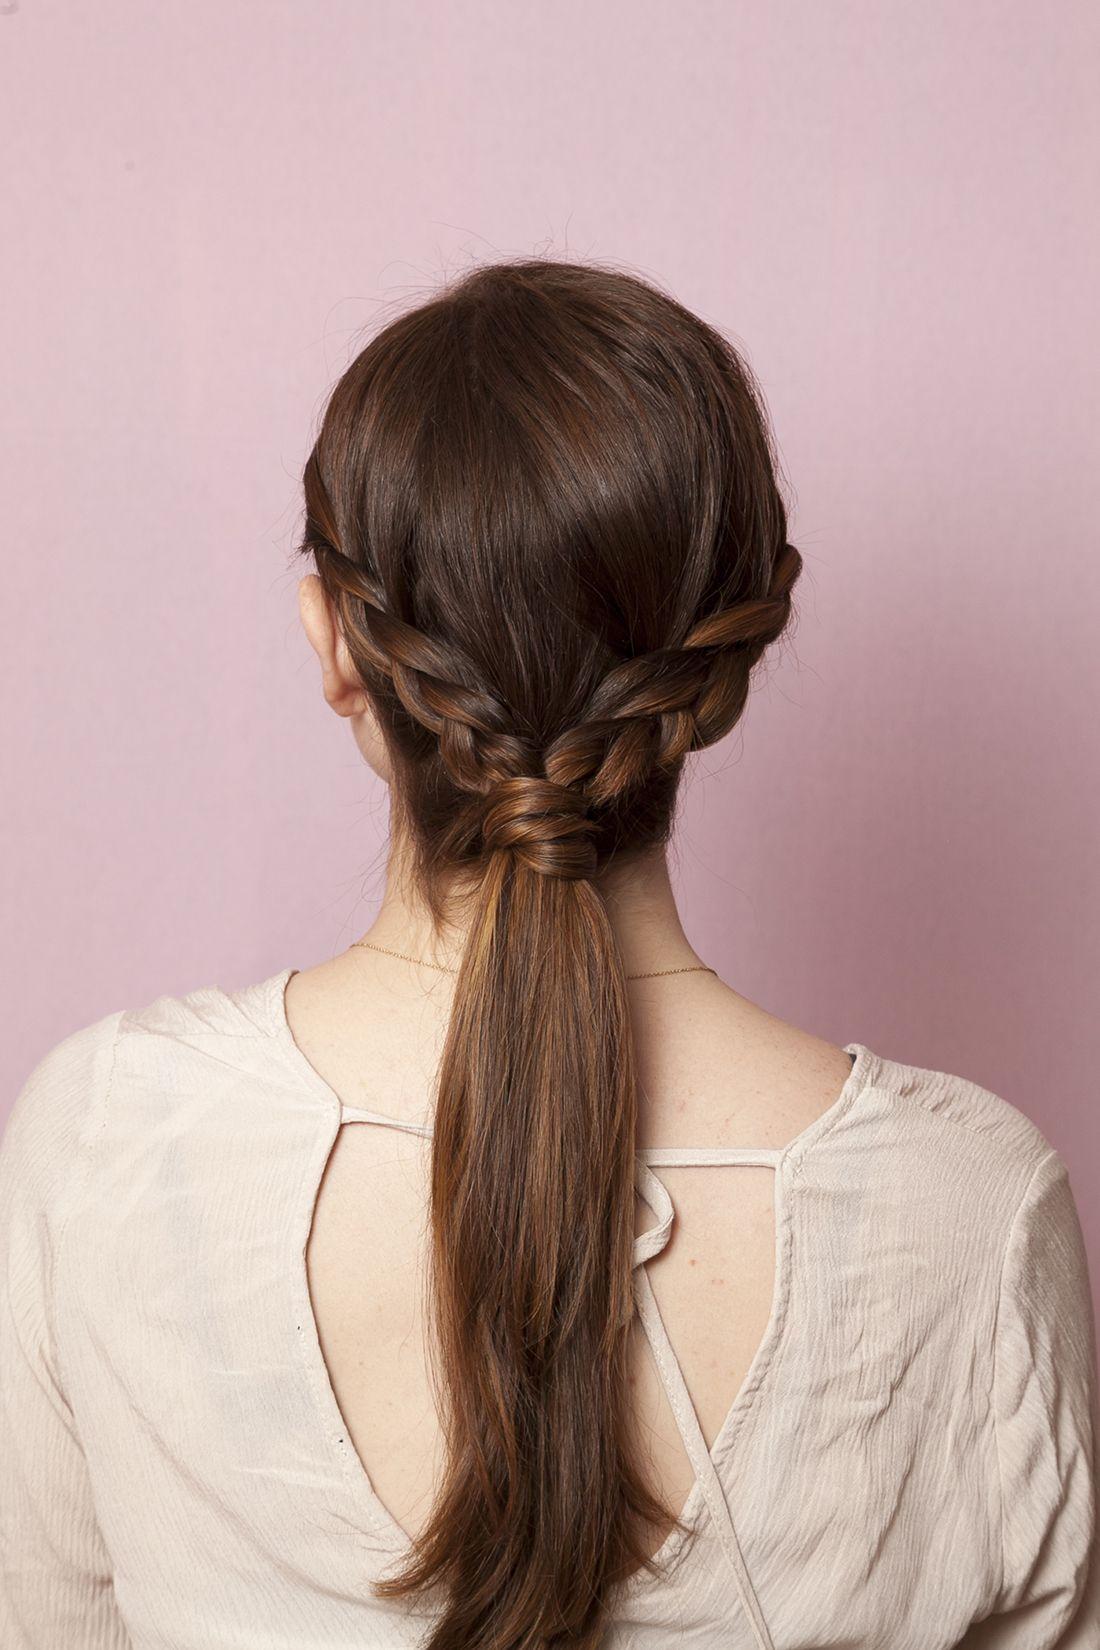 Rock this versatile low braid in minutes flat super easy hair